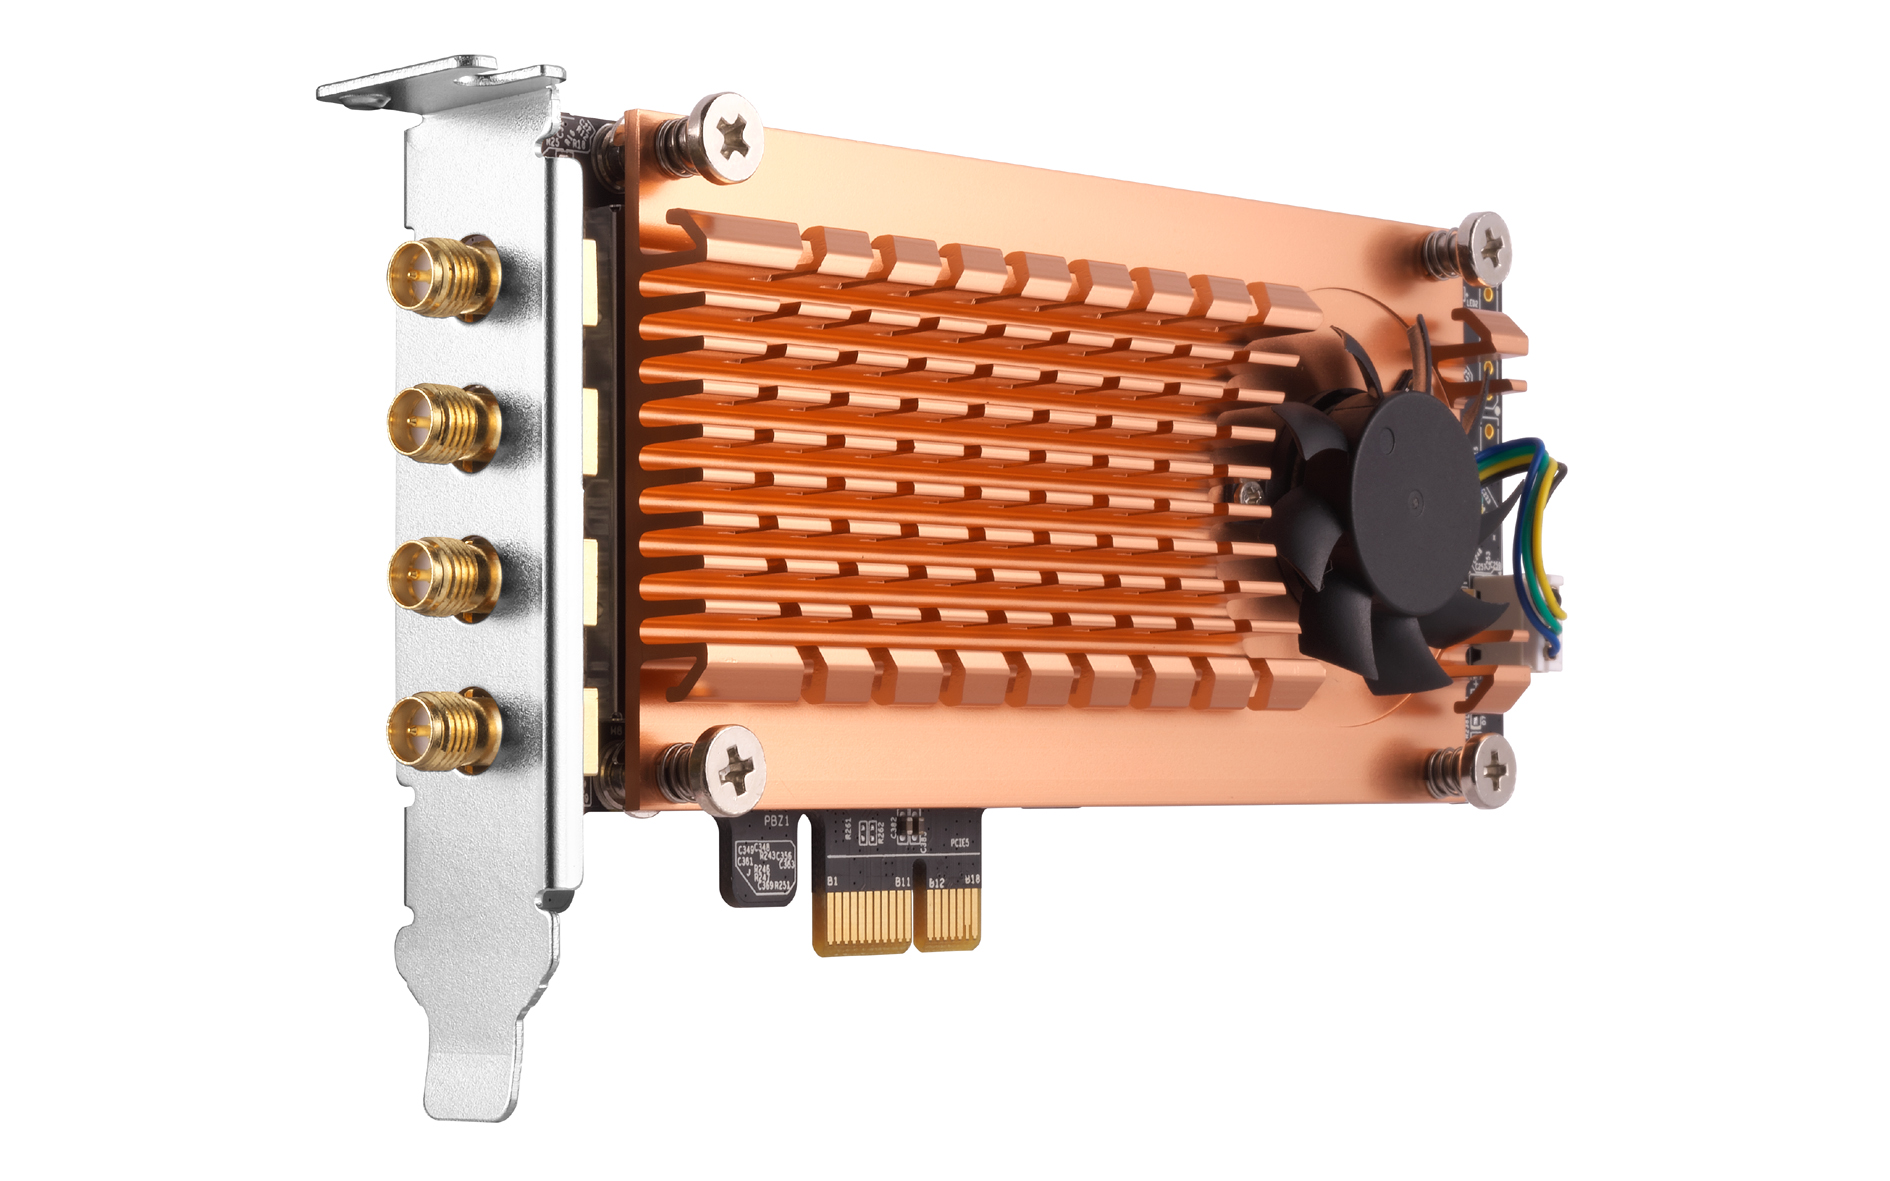 QWA-AC2600: Qnap stellt WLAN-Adapter mit zwei Netzwerkkarten vor - Qnap QWA-AC2600 (Bild: Qnap)